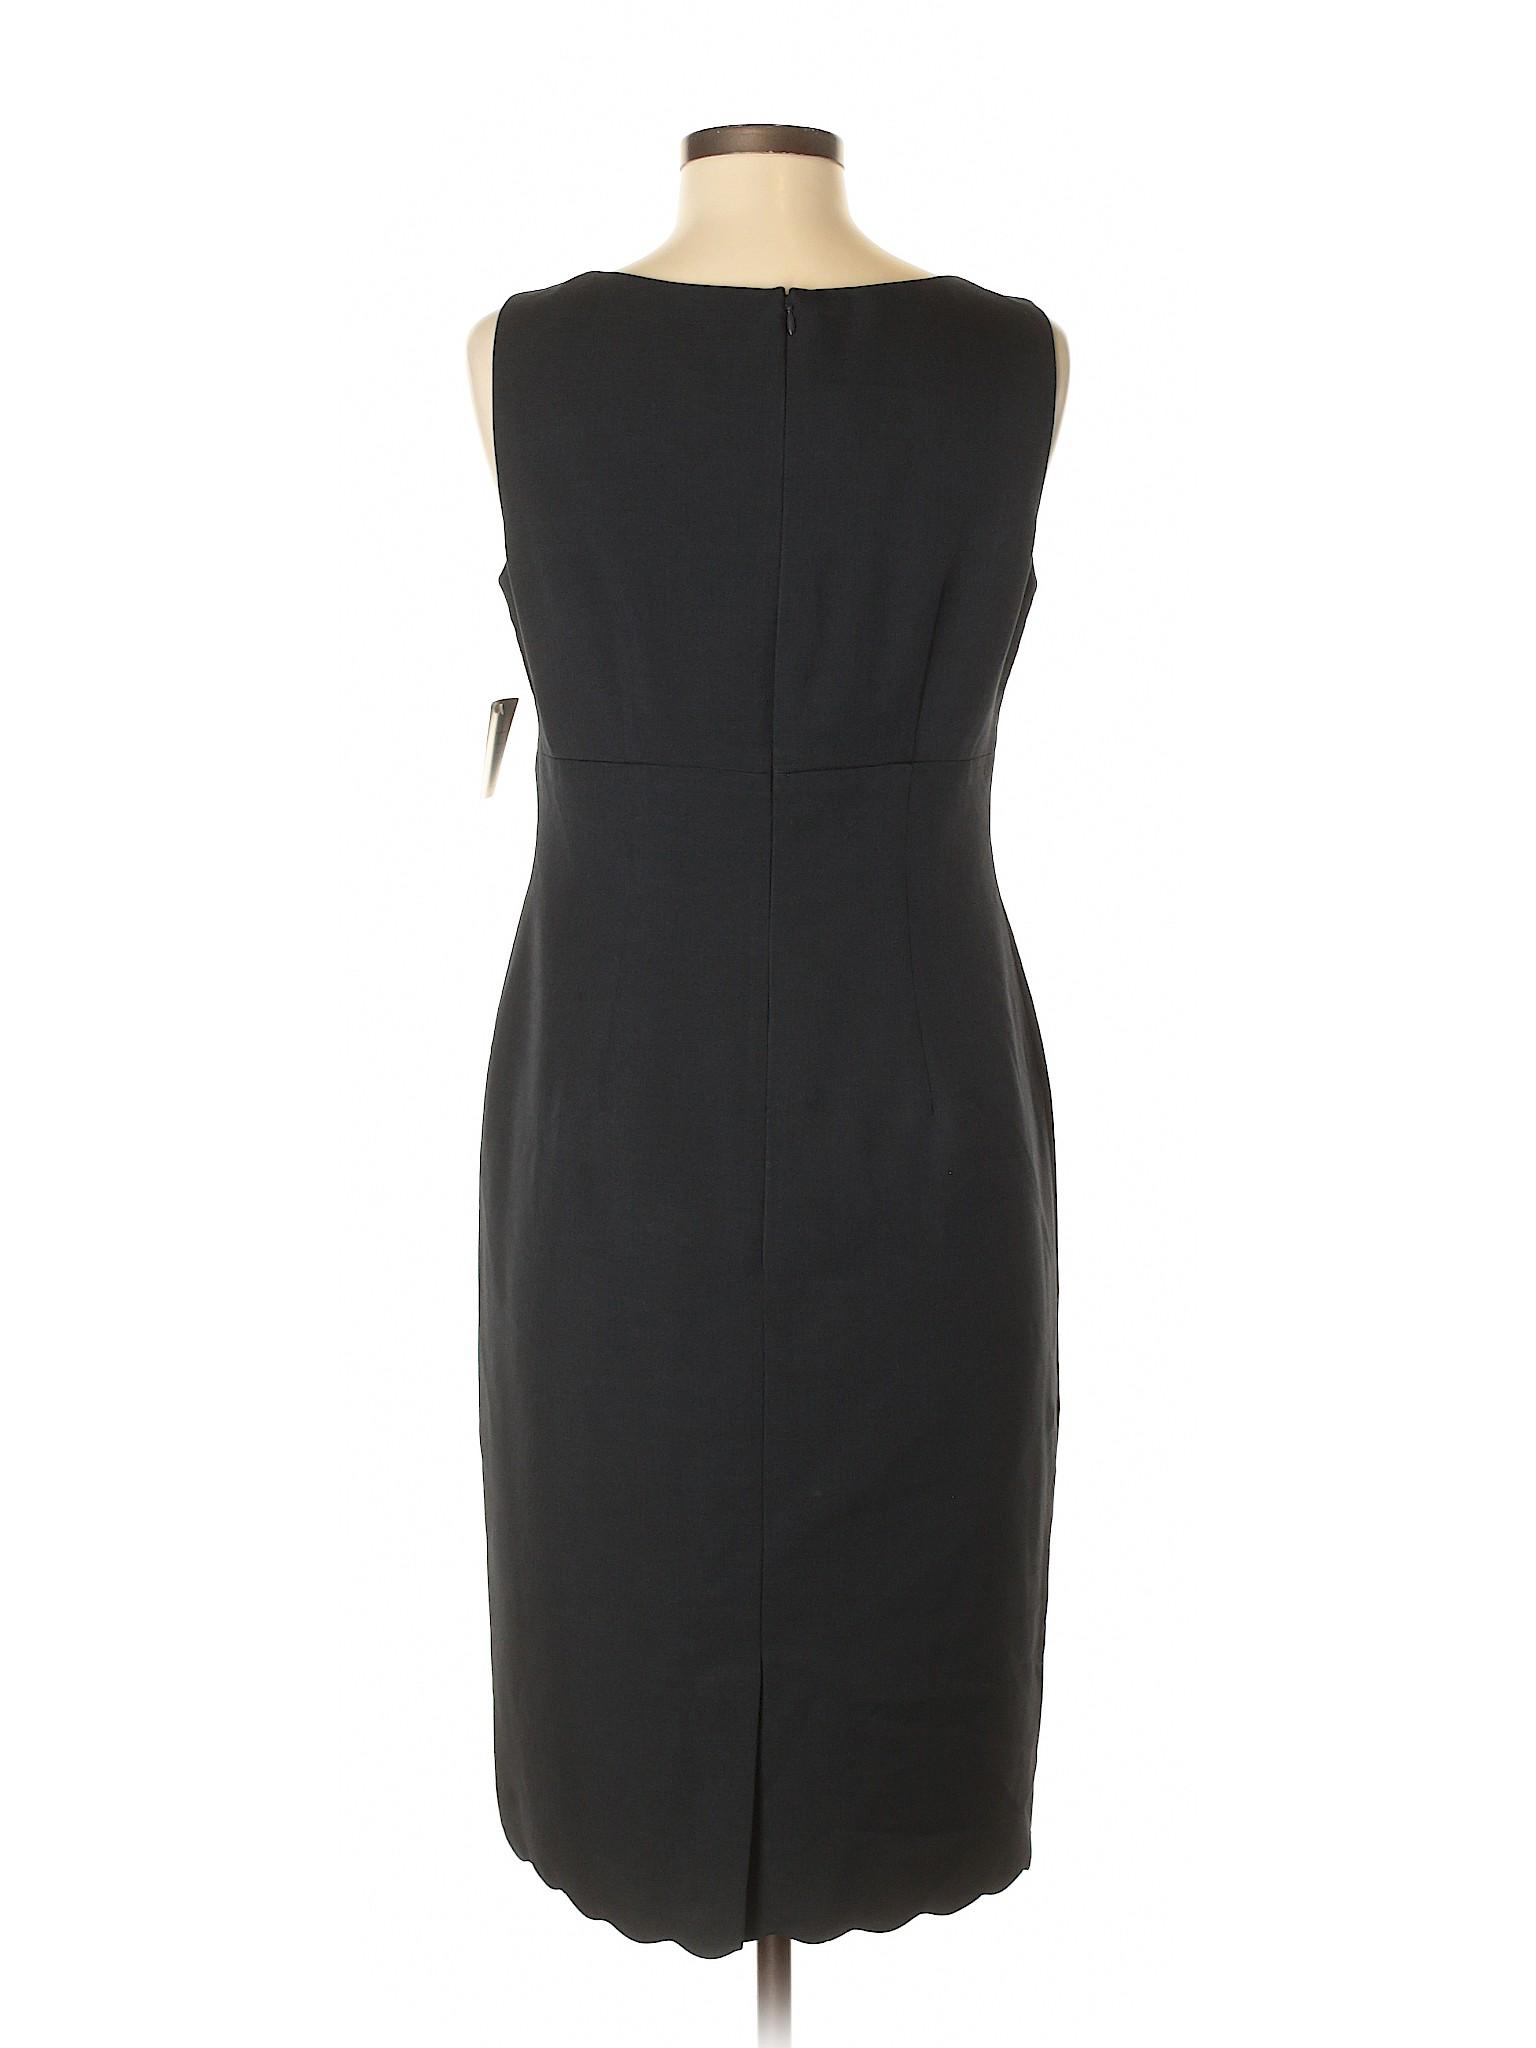 Dress Boutique Boutique Kasper Casual winter winter 78Un4